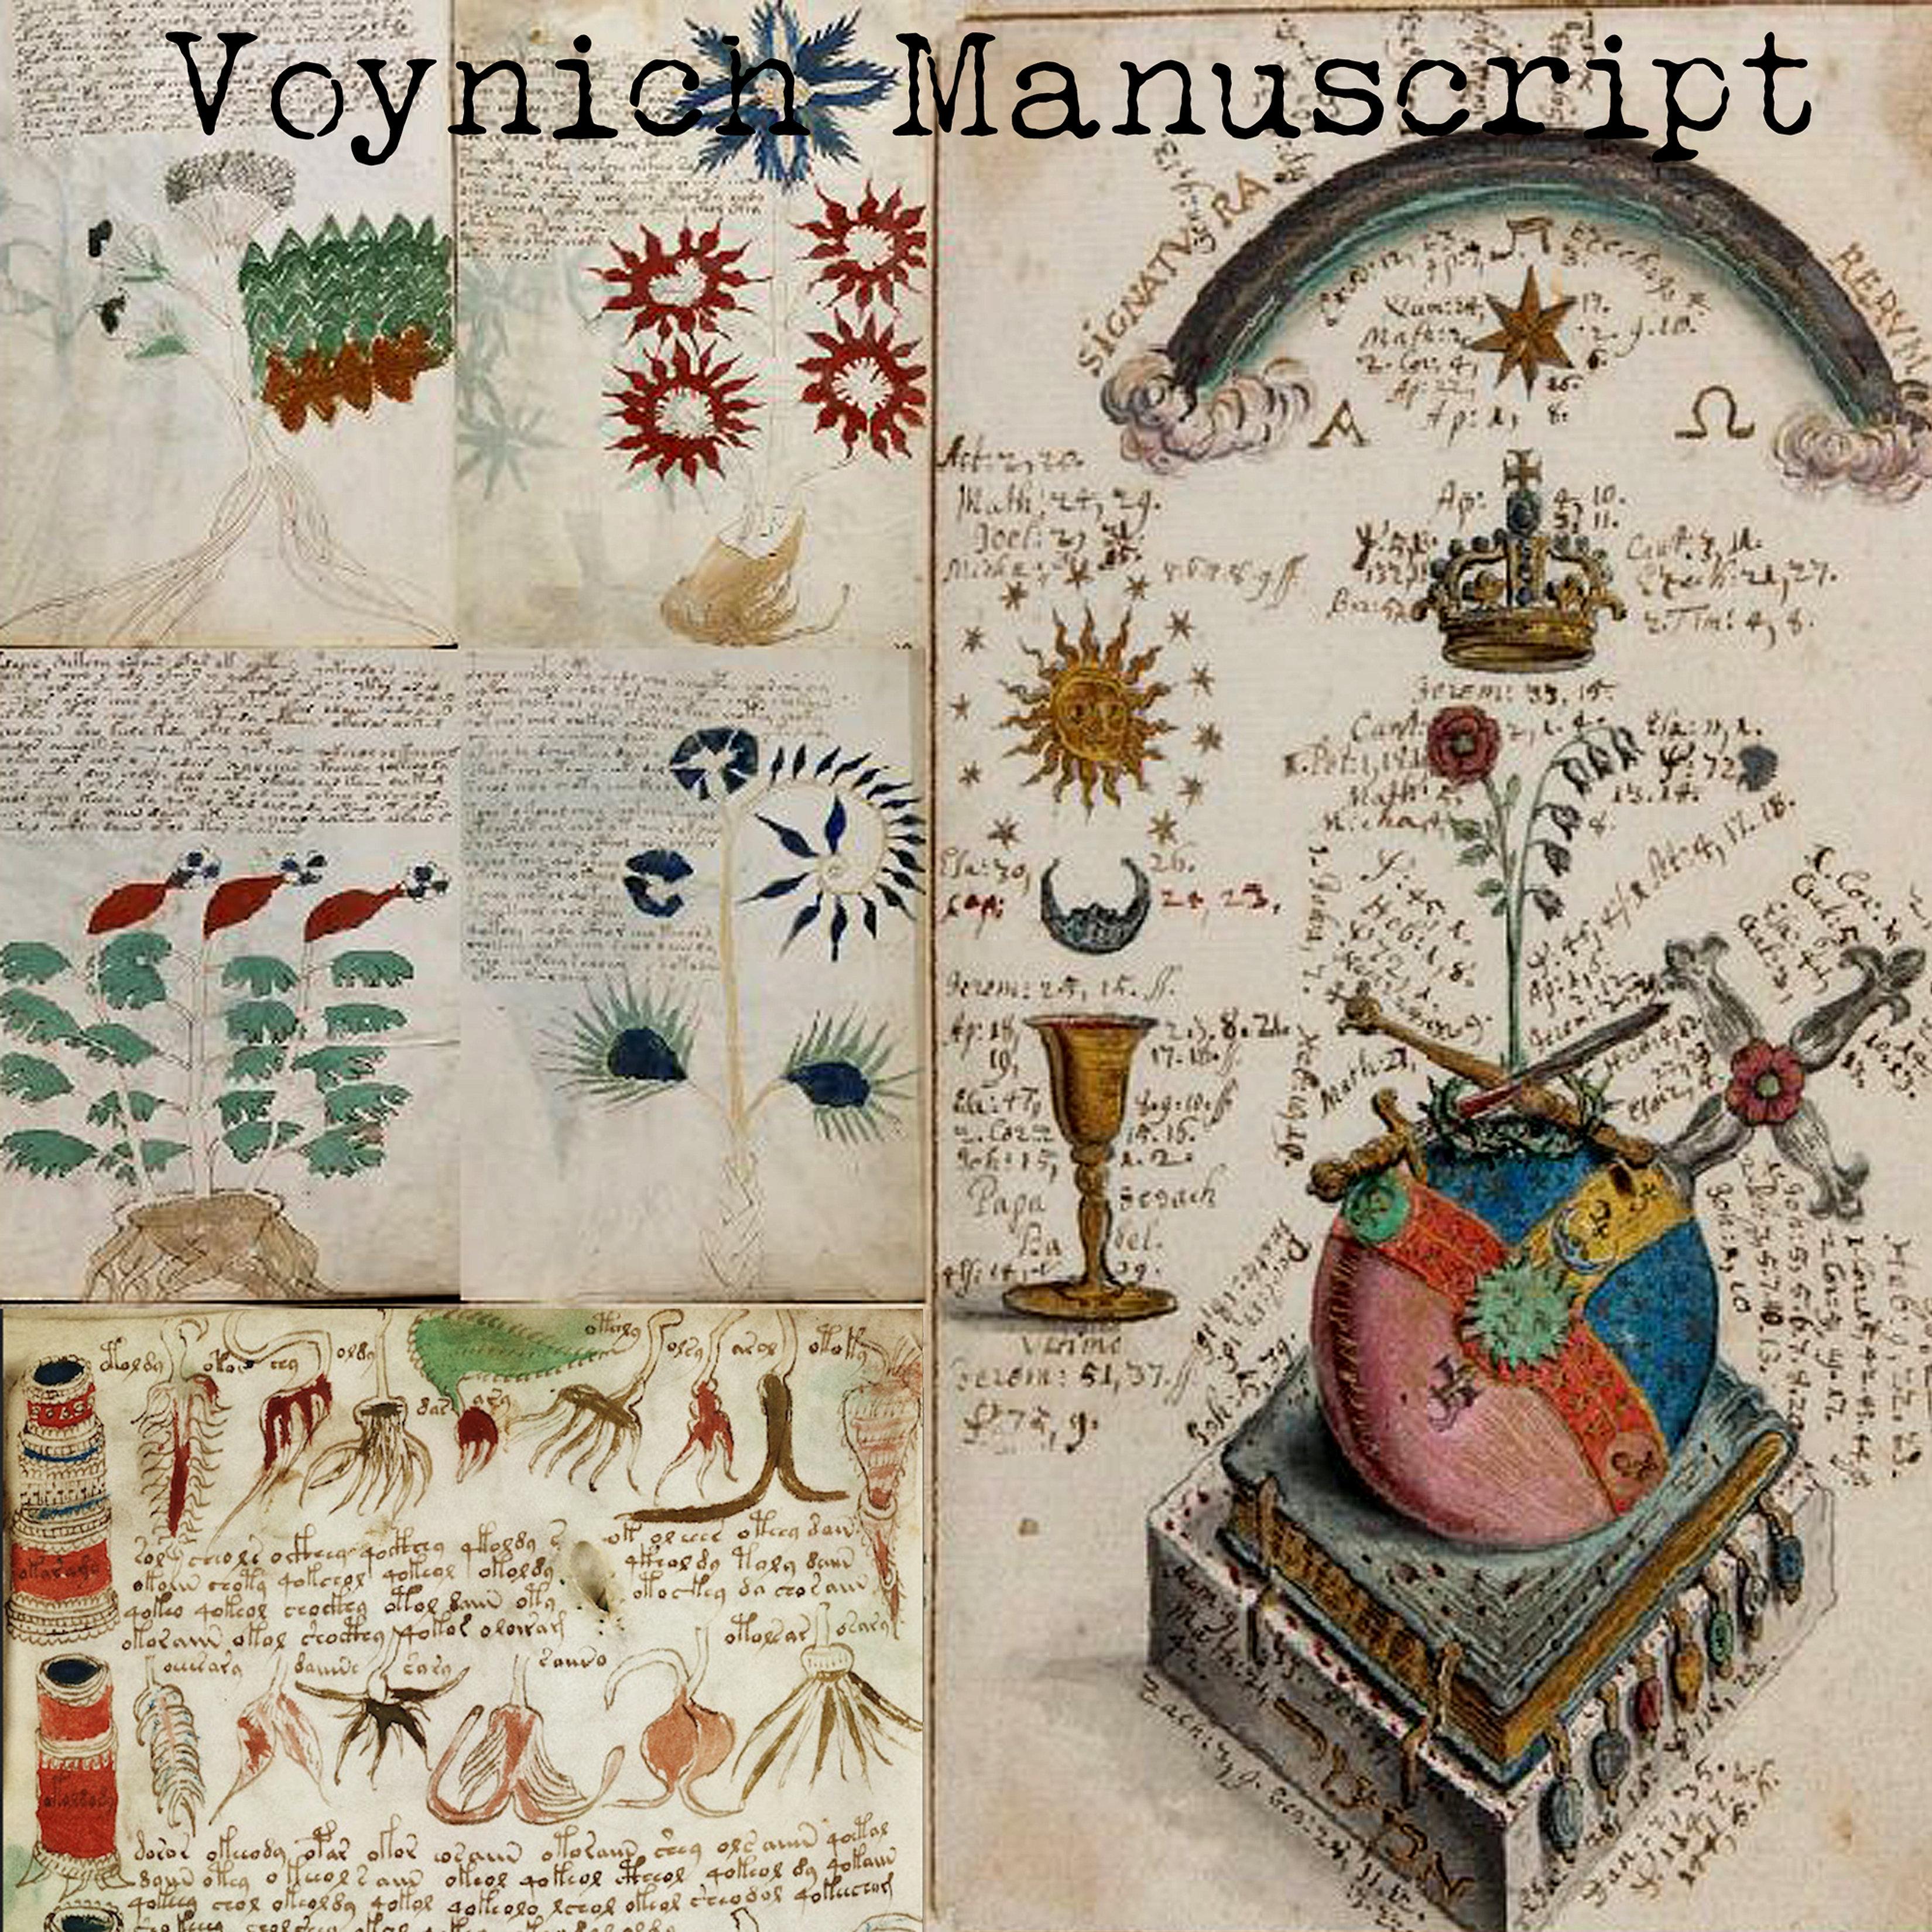 voynich manuscript pdf download